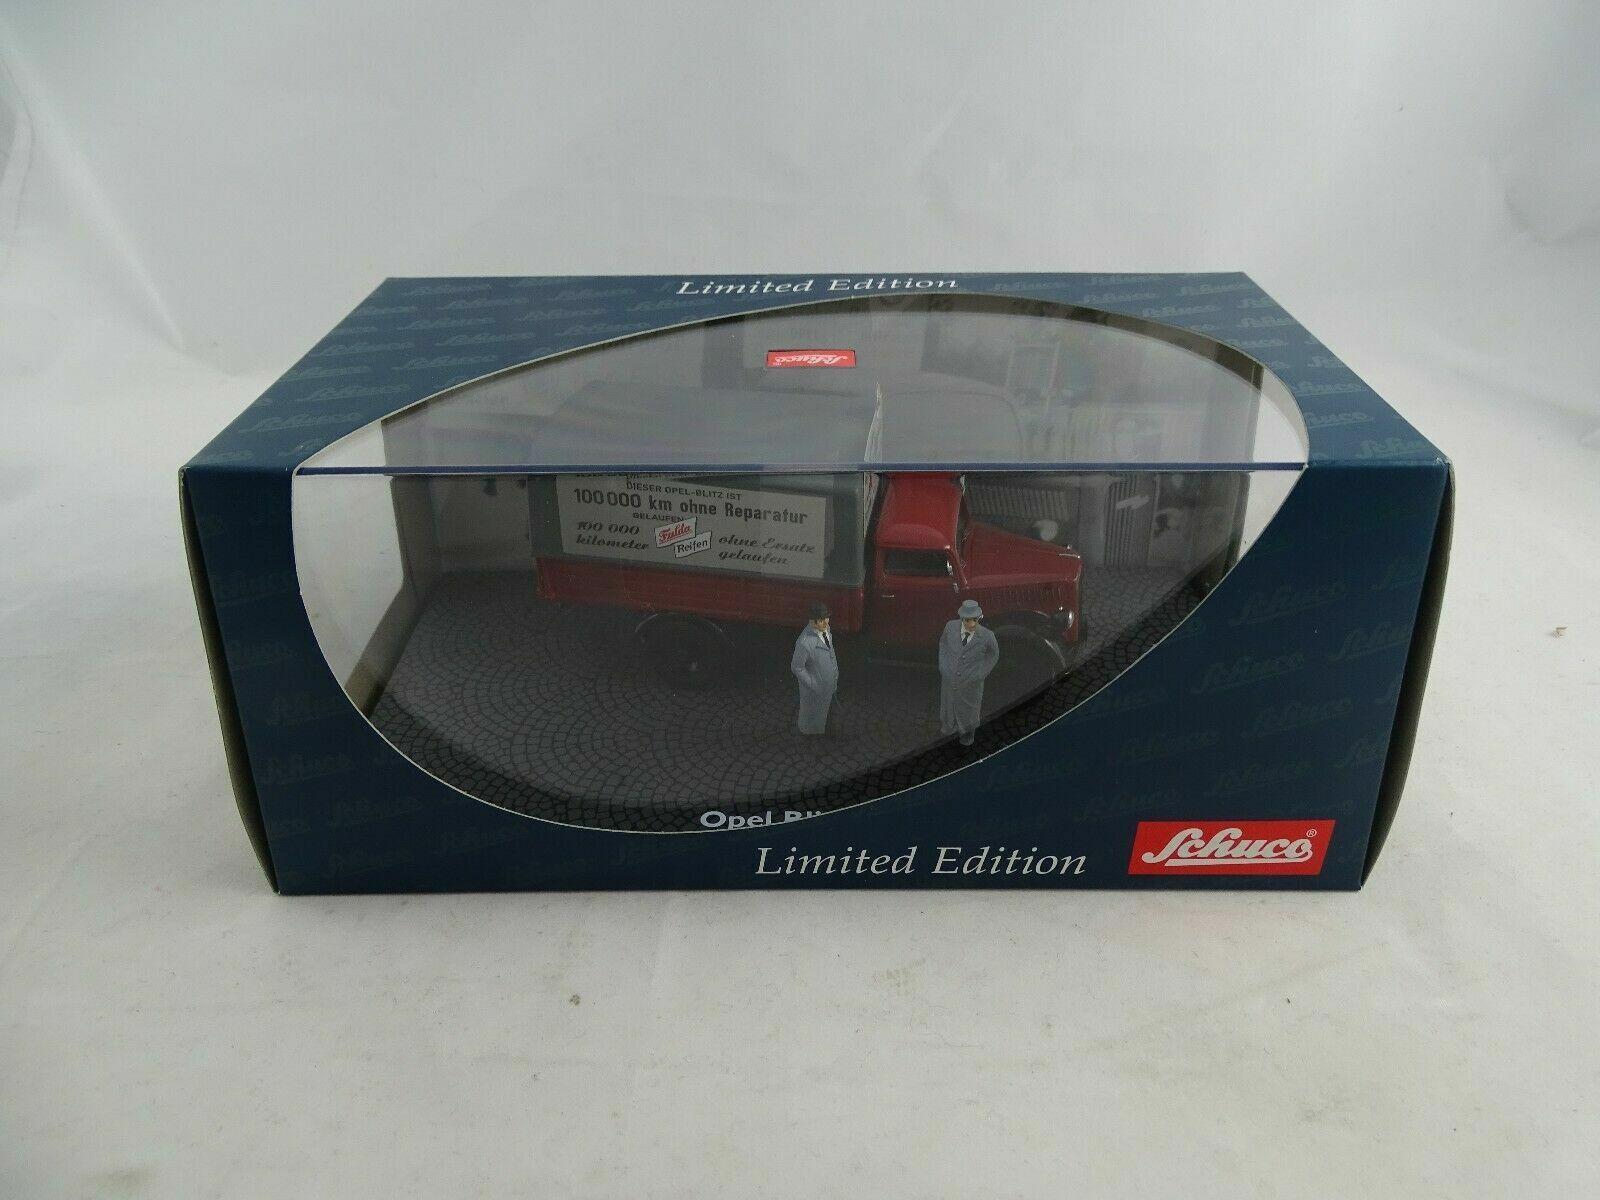 1 43 Schuco 03064 OPEL BLITZ S 3 T FULDA Pneus avec 2 personnages Limited Edition Rar